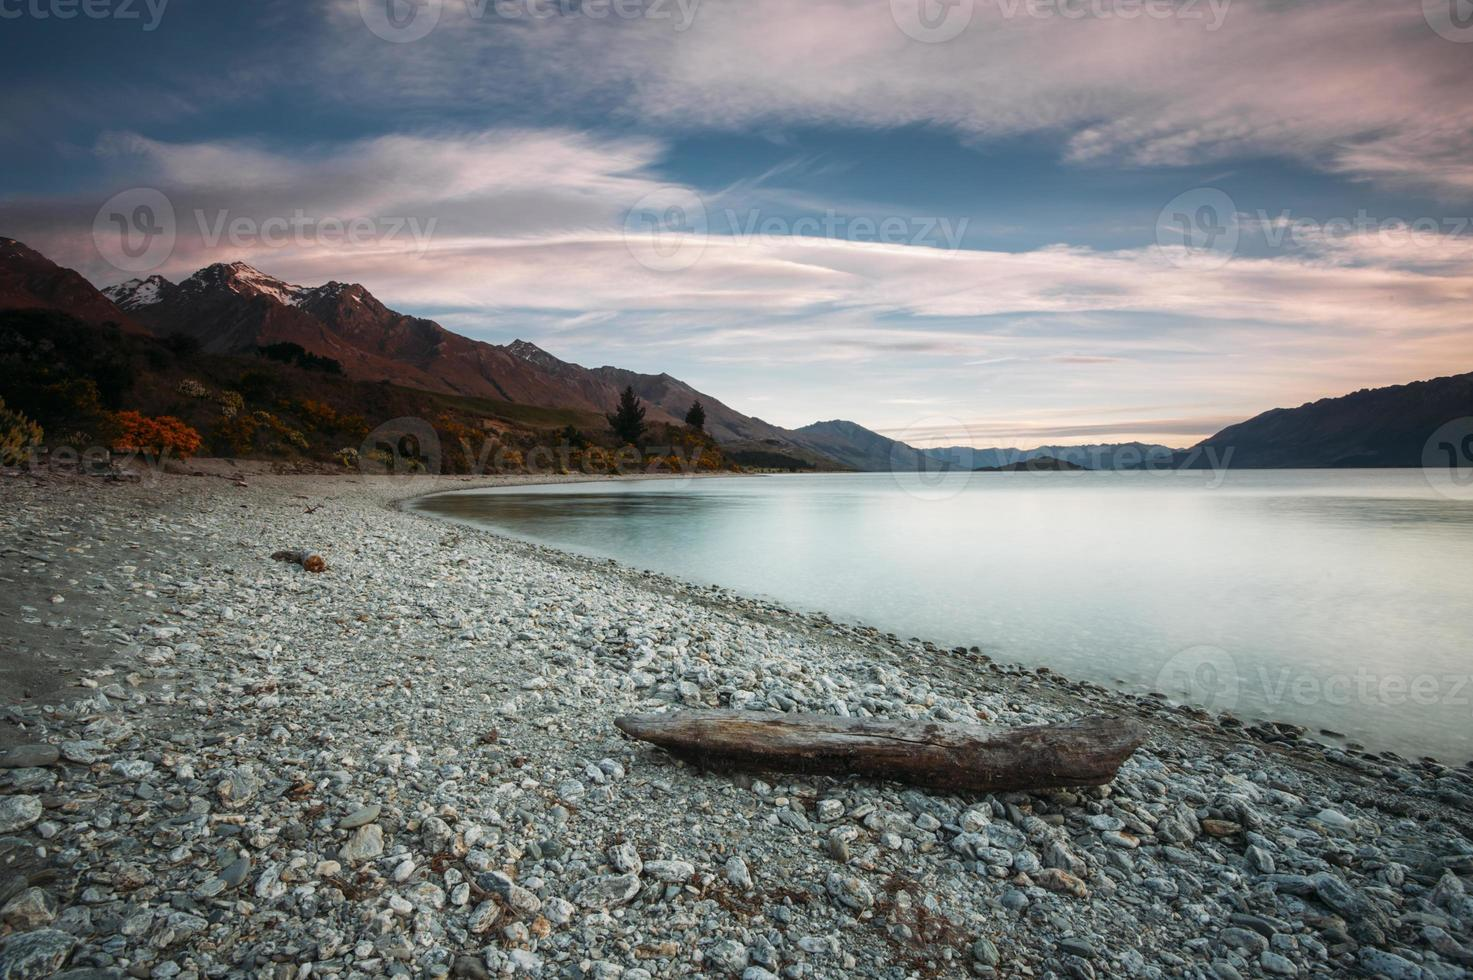 lago wakatipu, nova zelândia foto